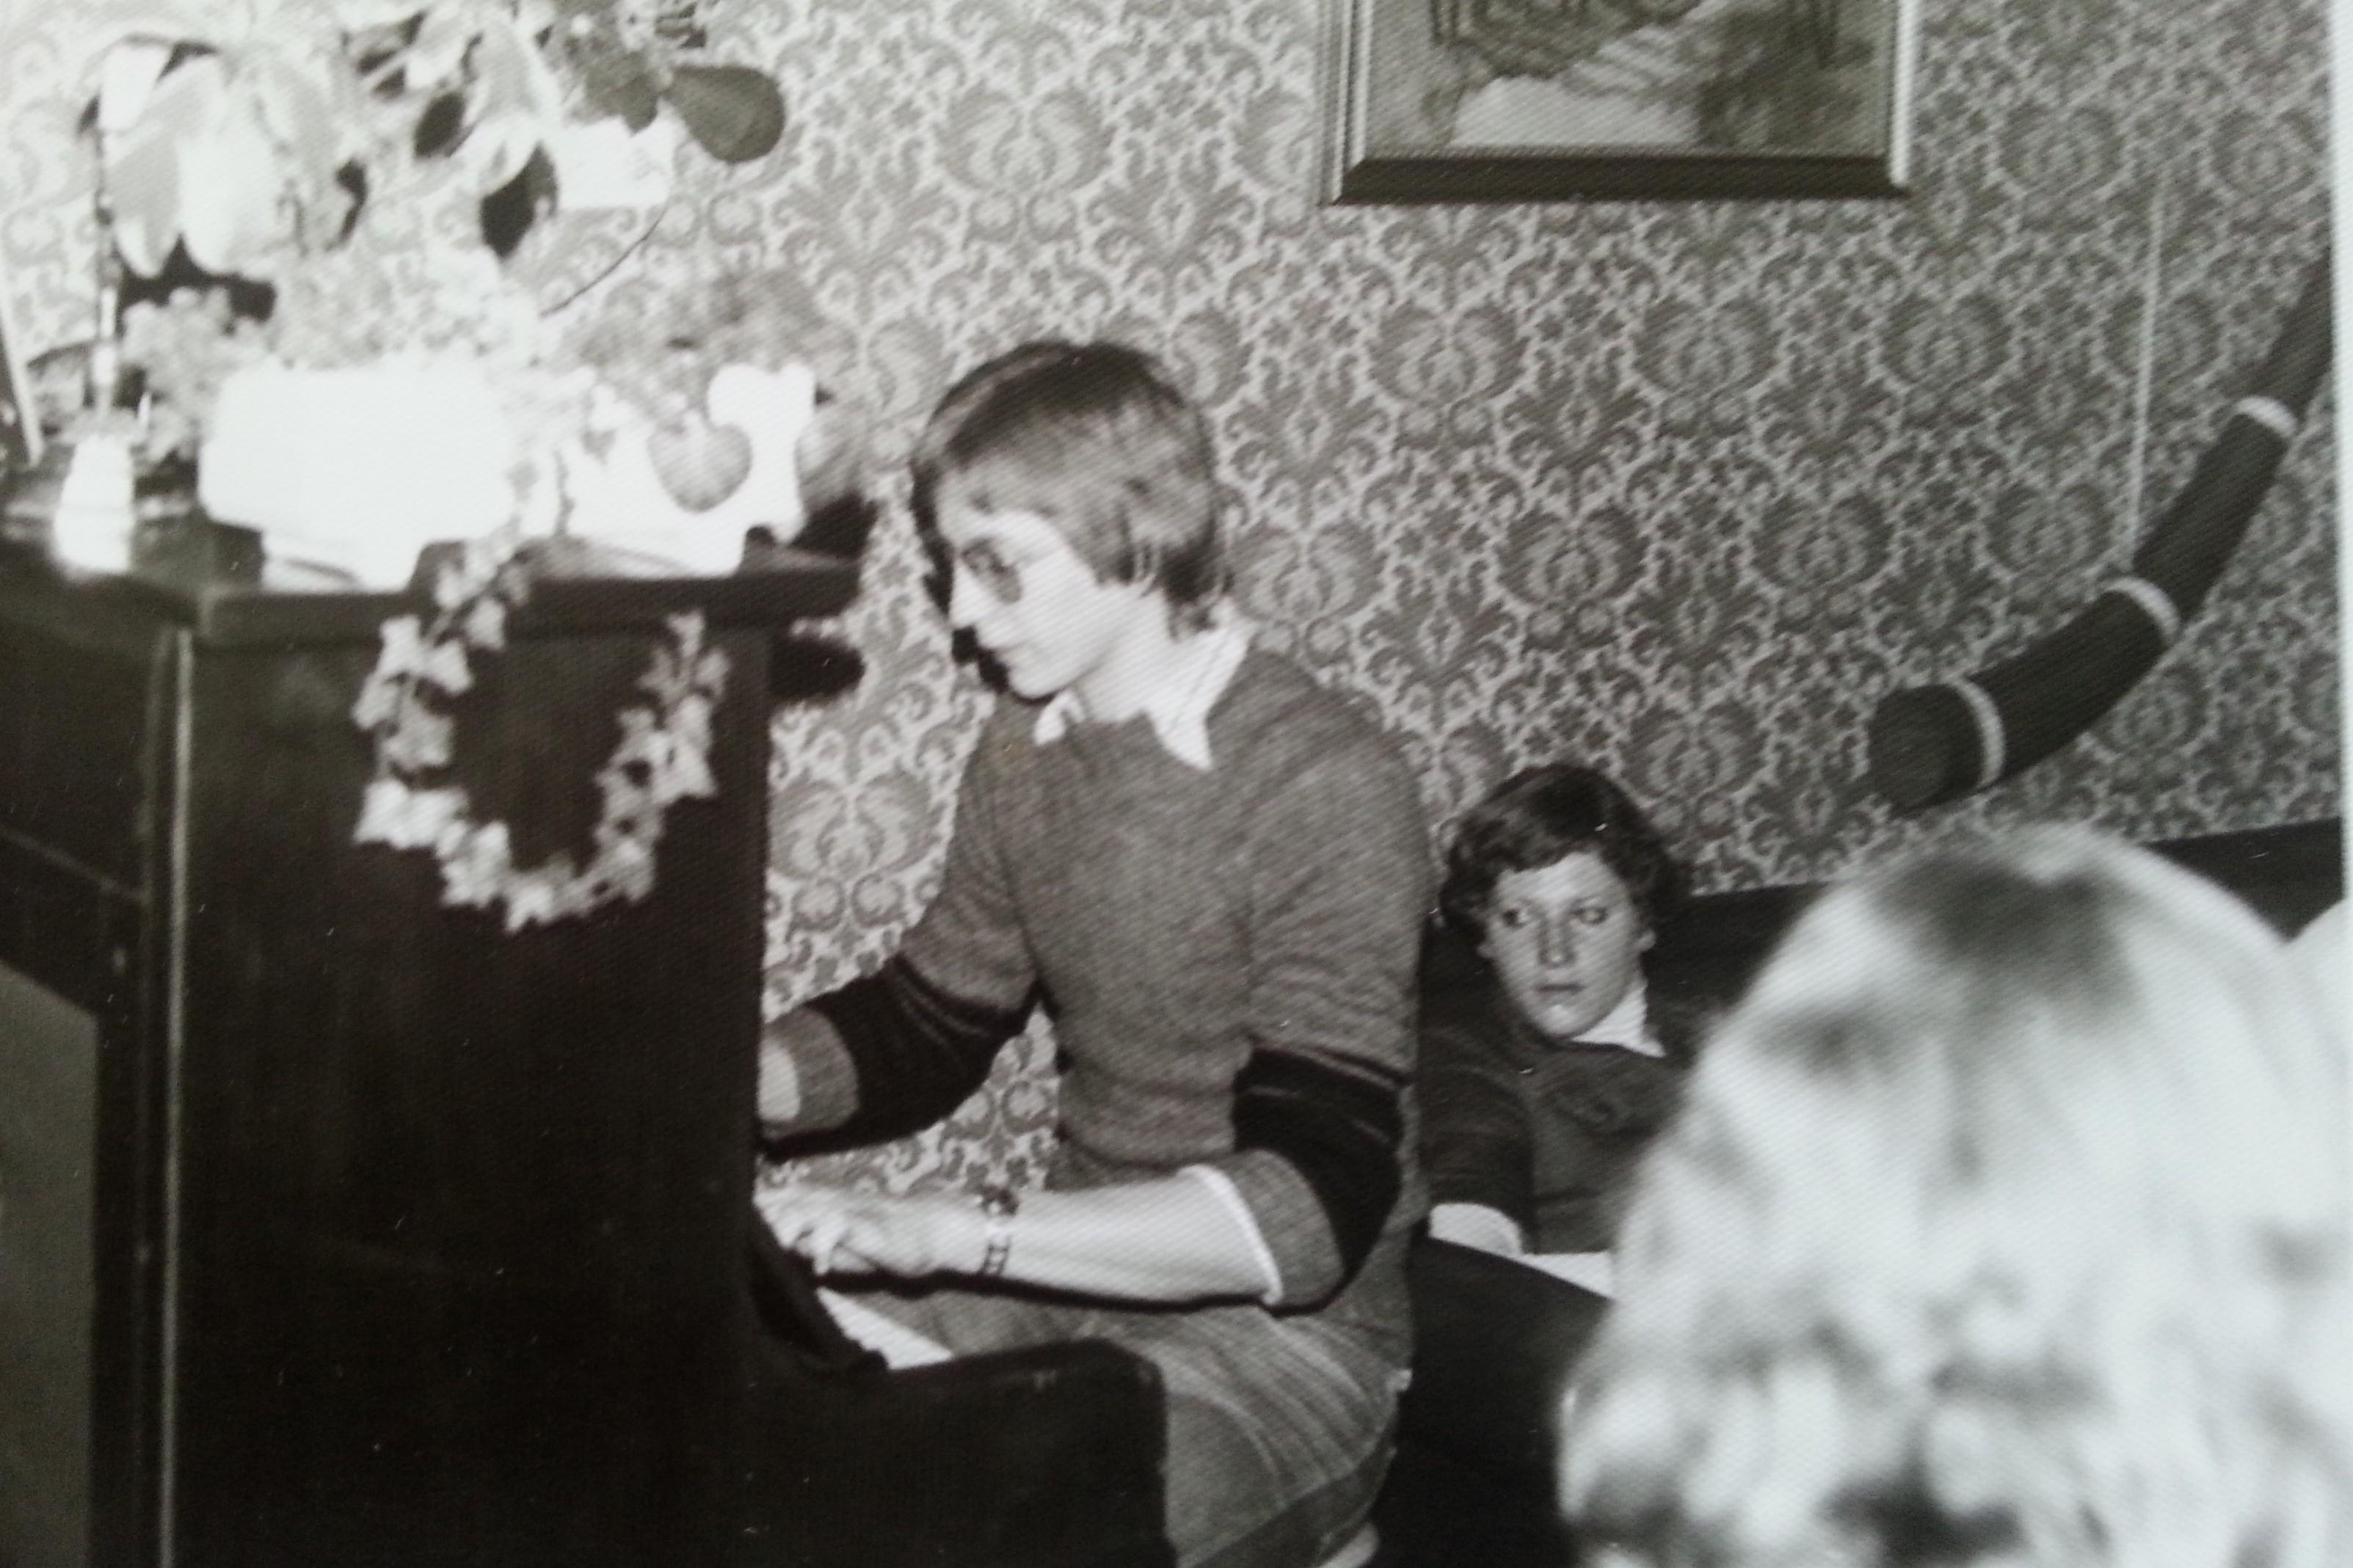 Verjaardagsfeestje bij Marja / 1971